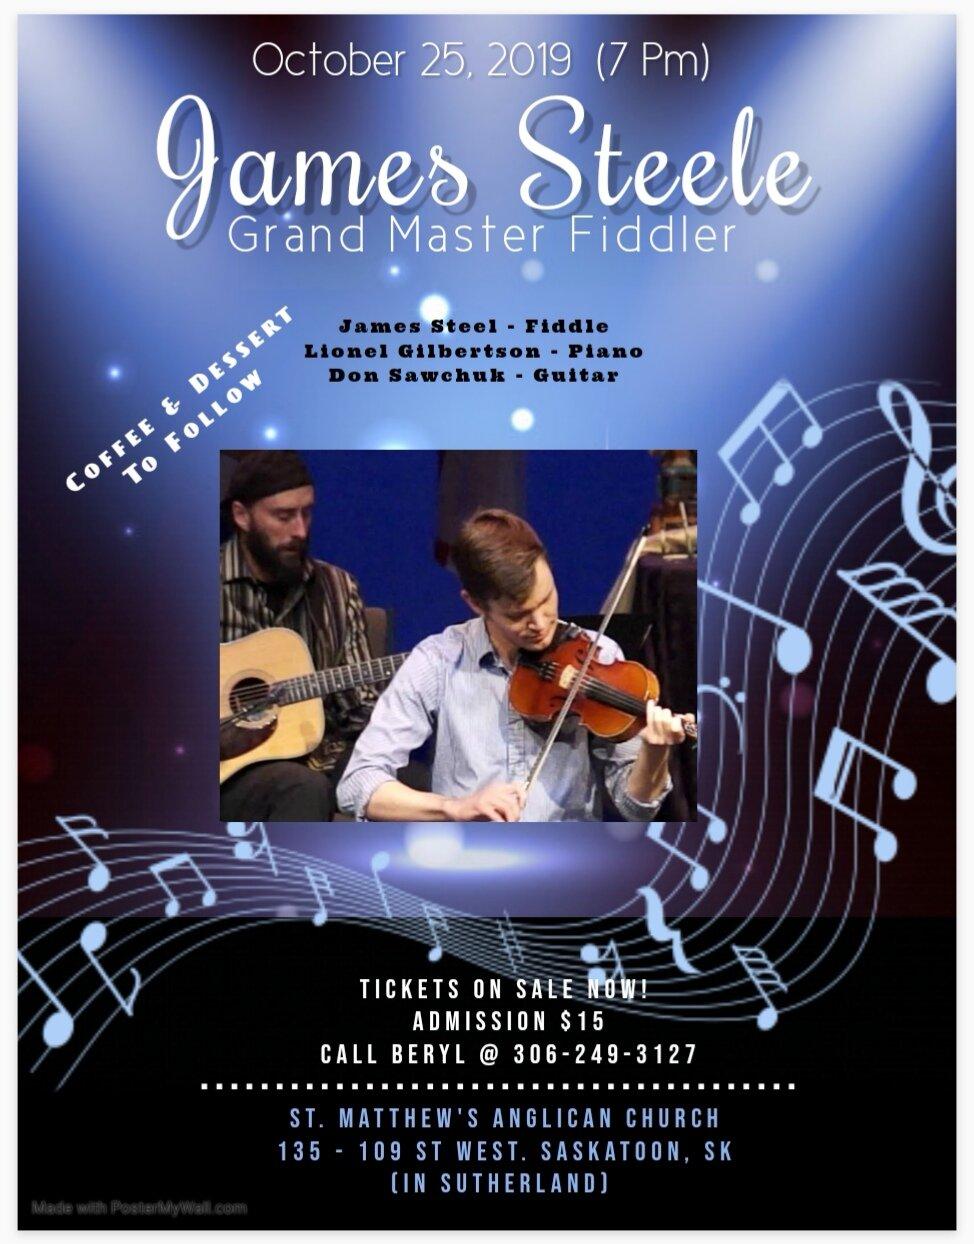 James Steele Concert Poster.jpg